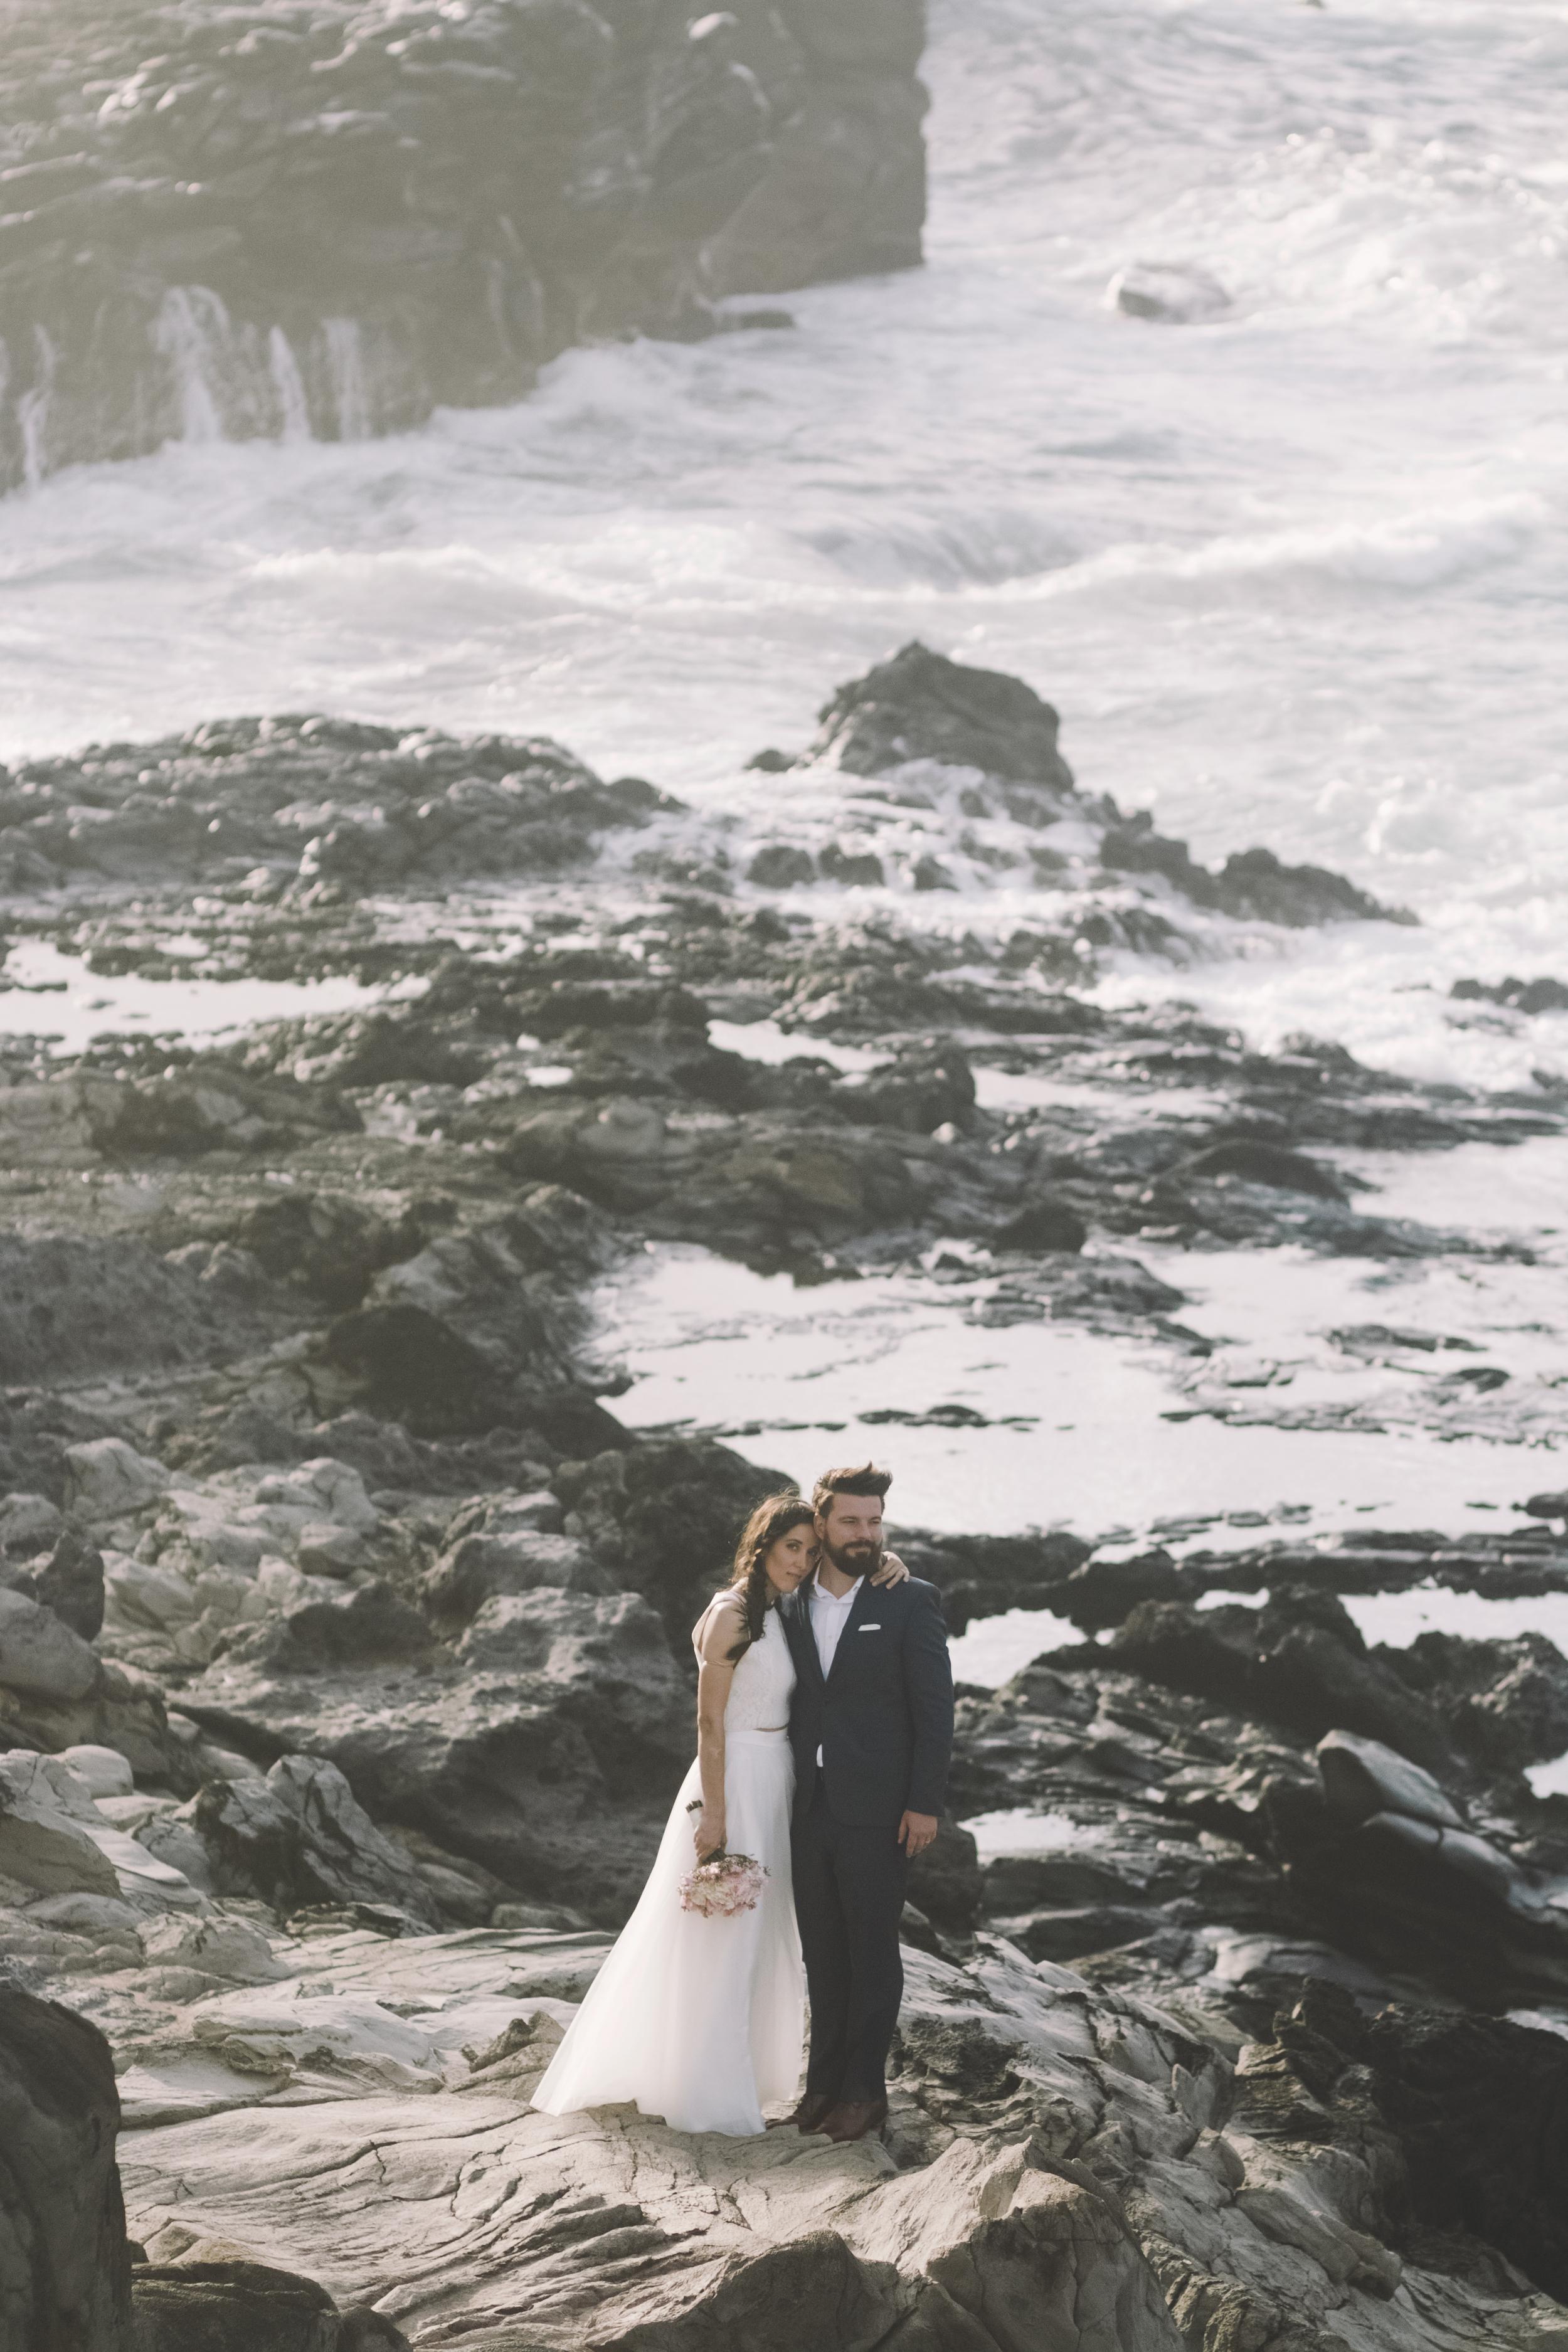 angie-diaz-photography-maui-wedding-ironwoods-beach-58.jpg